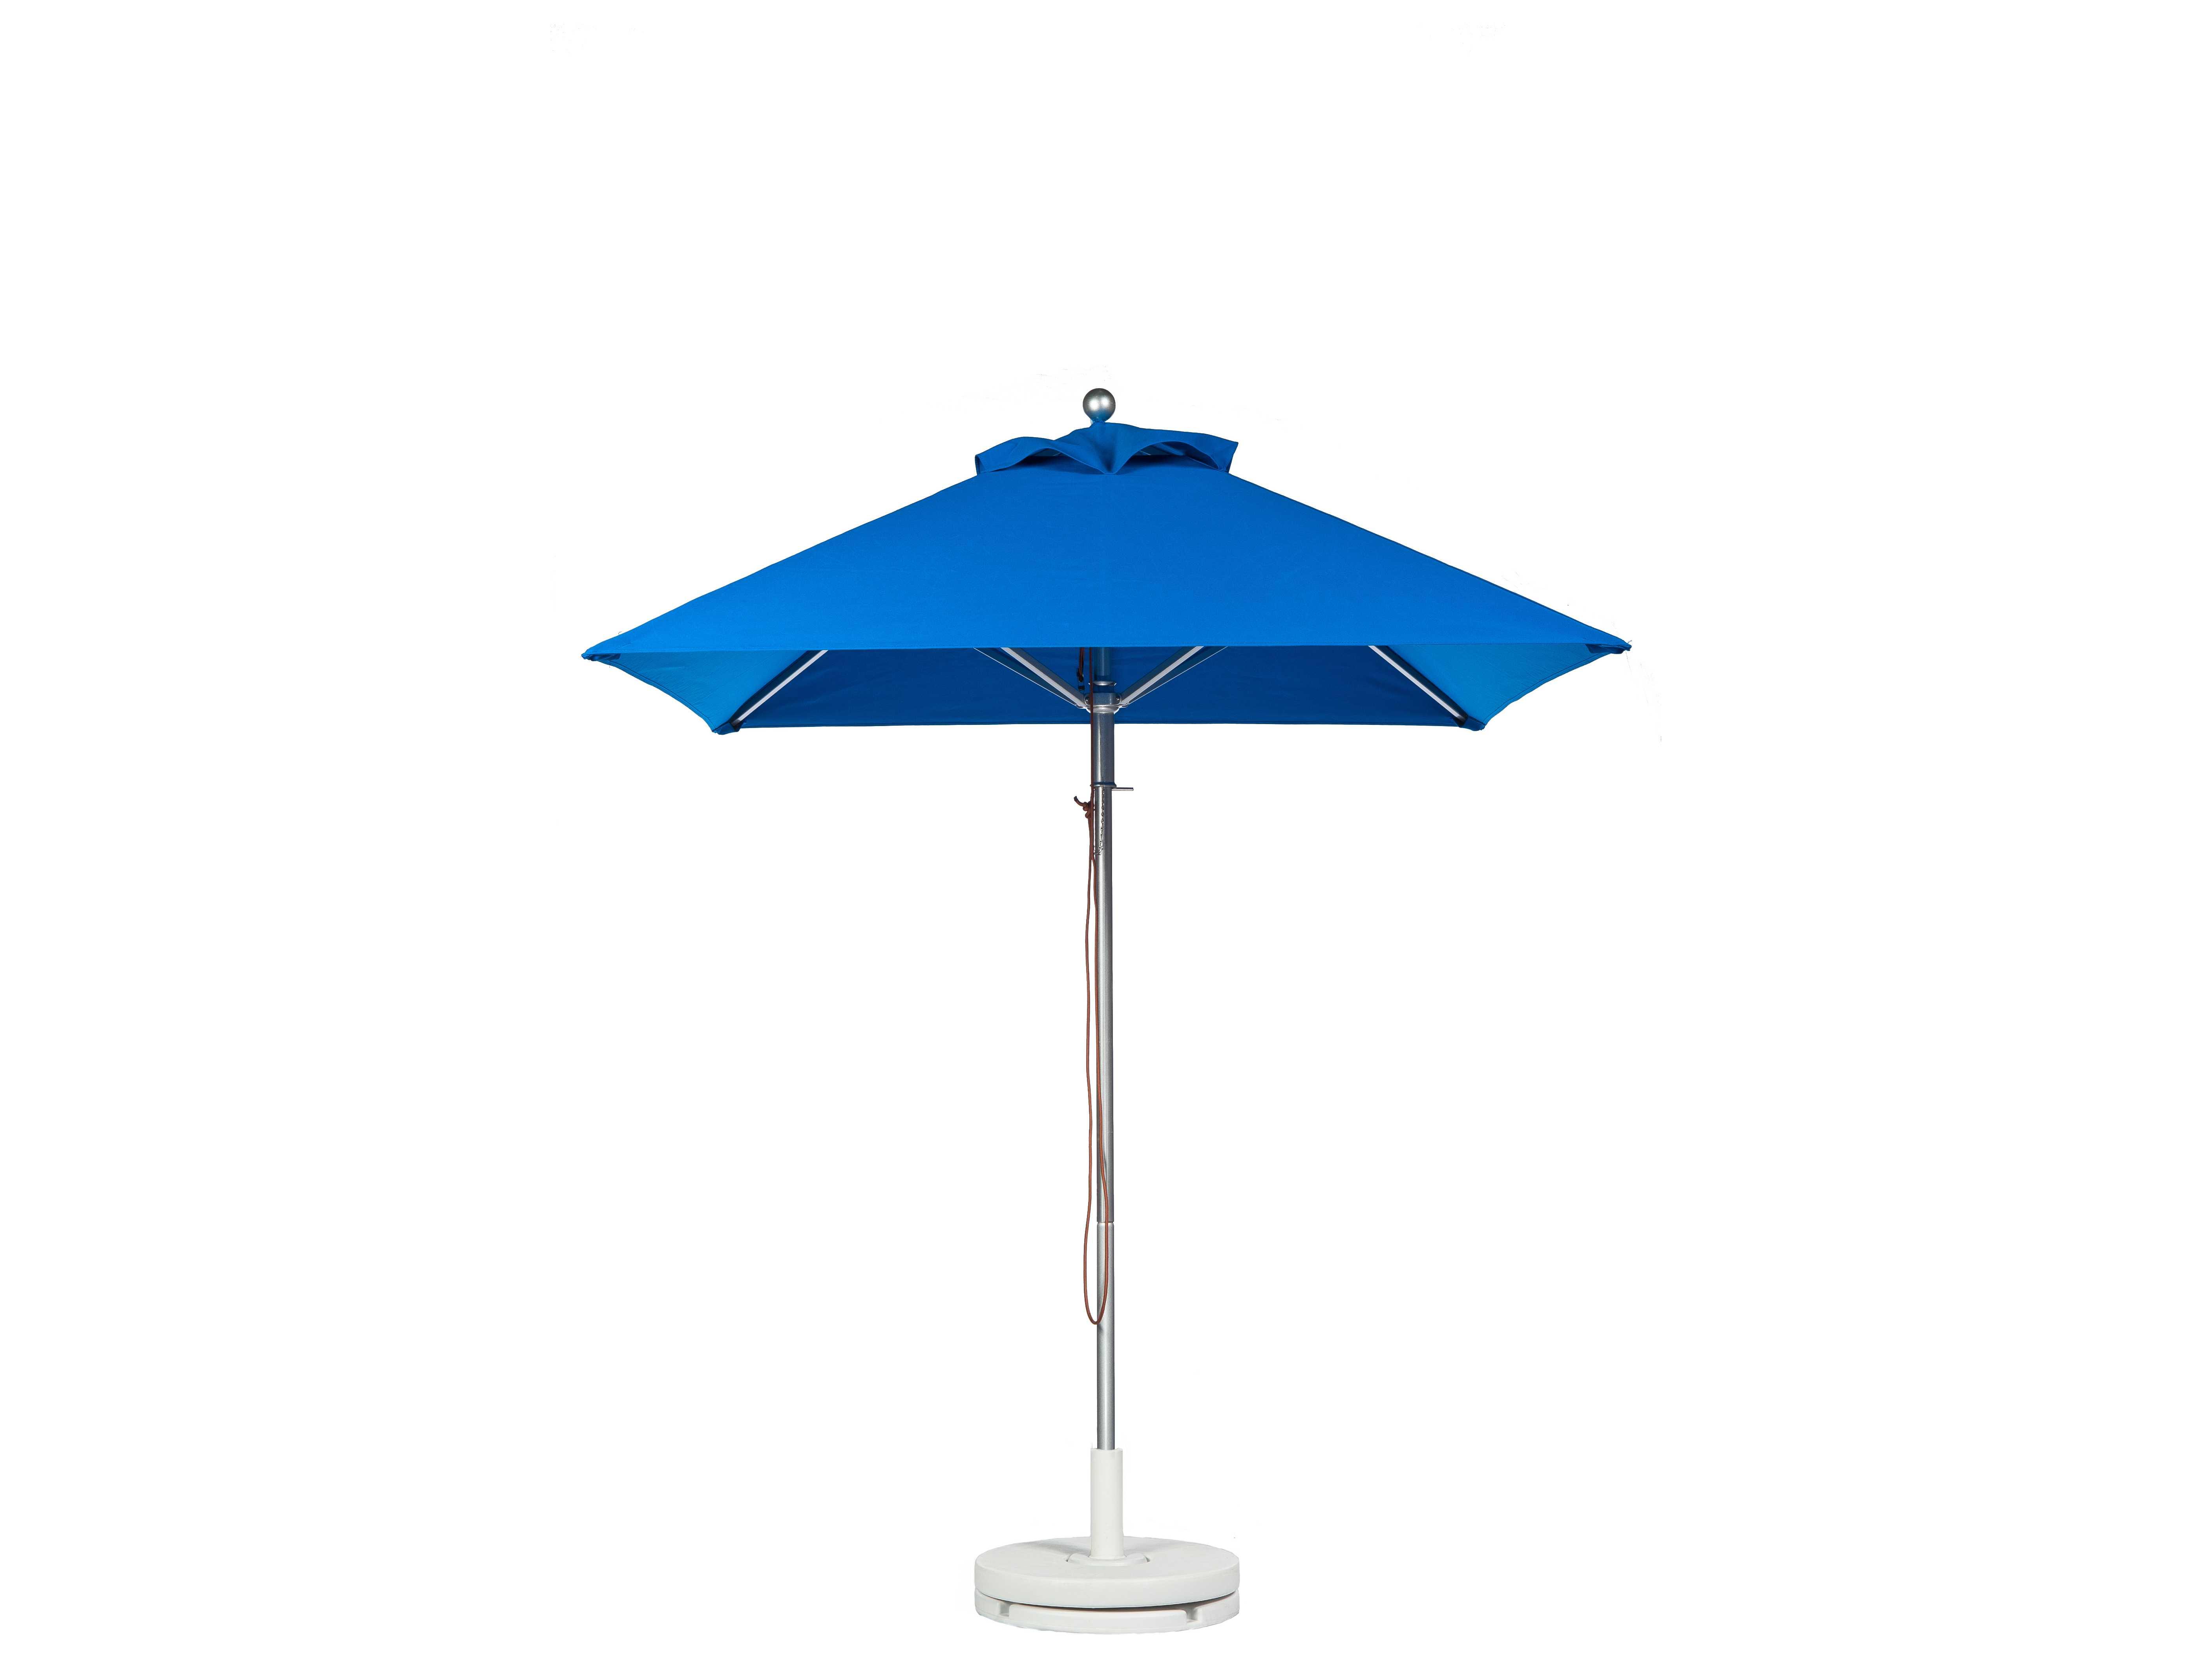 frankford greenwich aluminum market 6 5 foot wide square pulley lift umbrella 454cam. Black Bedroom Furniture Sets. Home Design Ideas